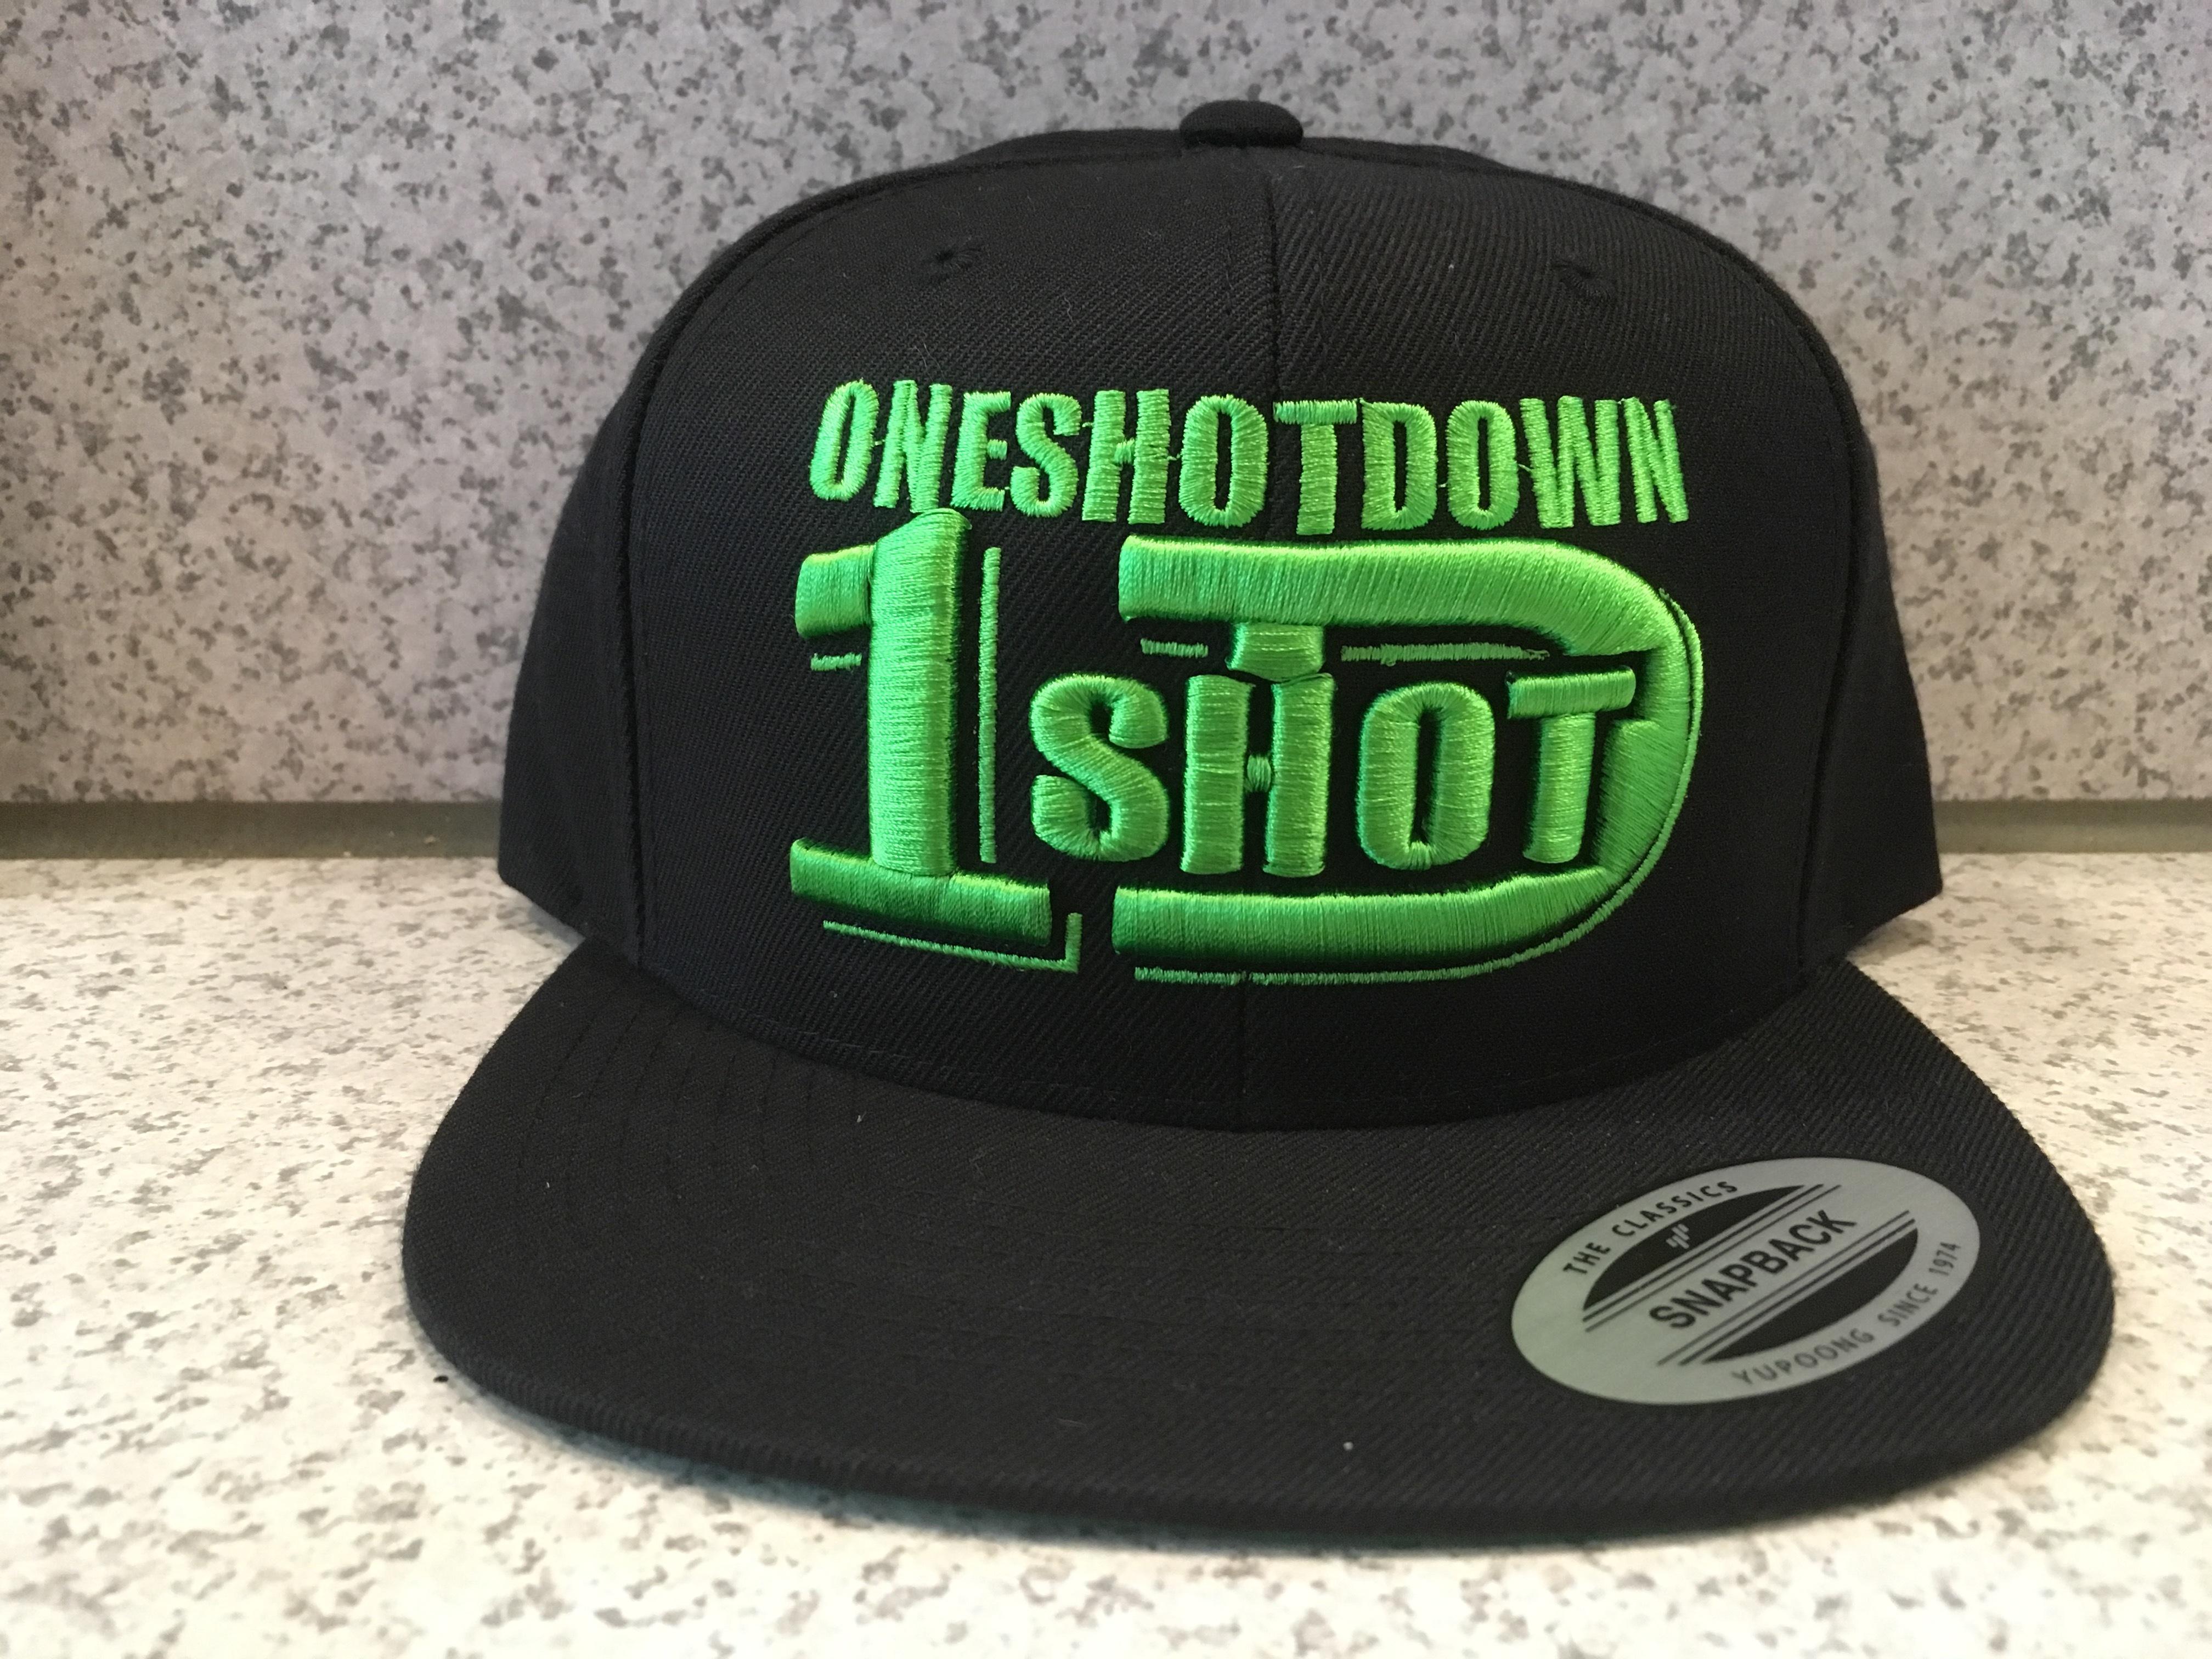 ONESHOTDOWNロゴ3D刺繍CAP - 画像3